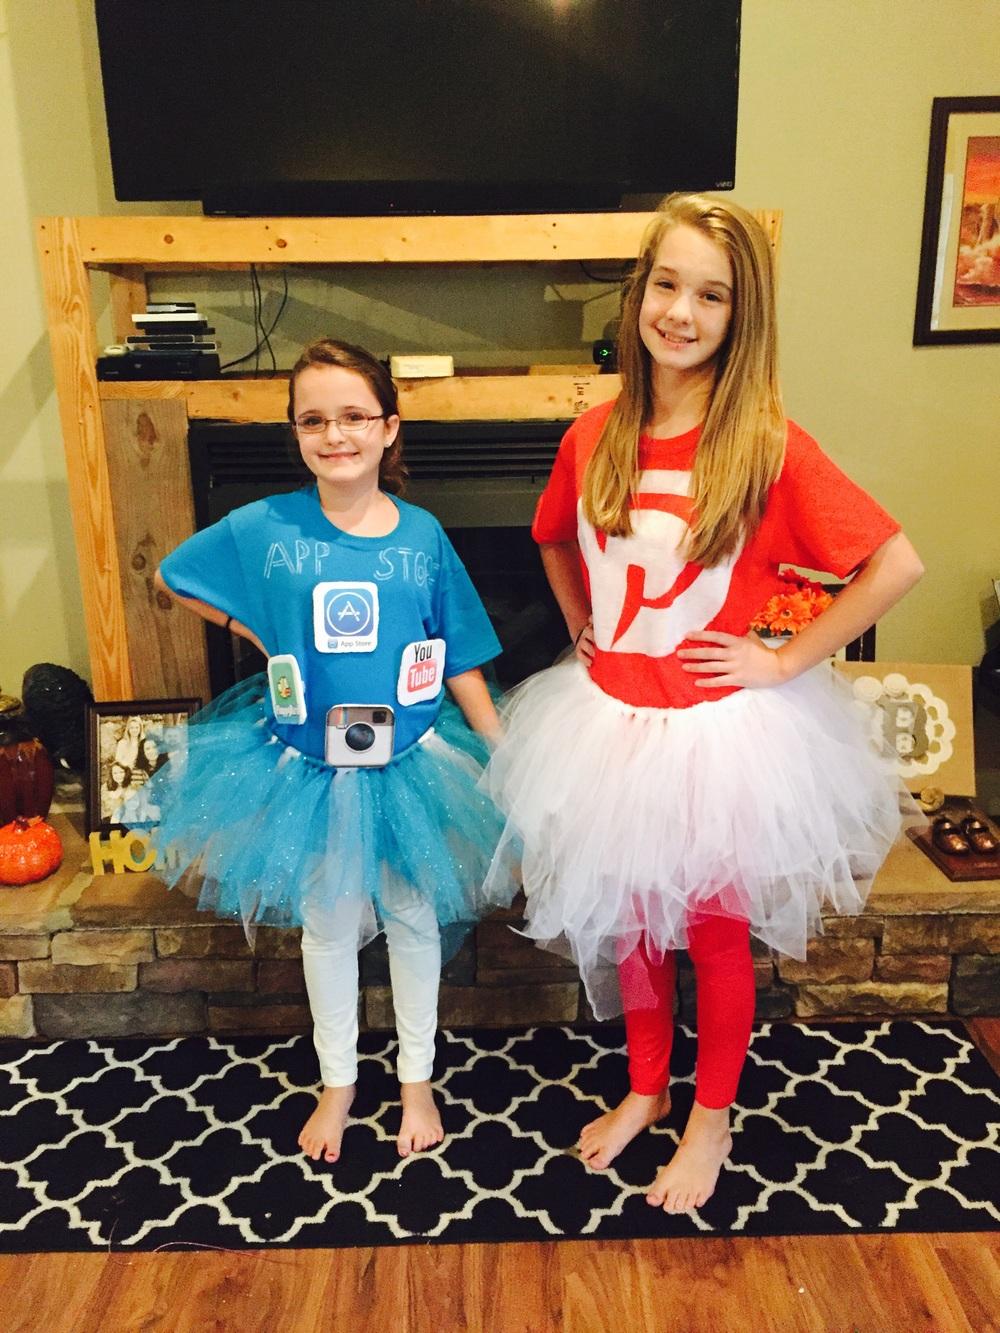 DIY APP costumes!